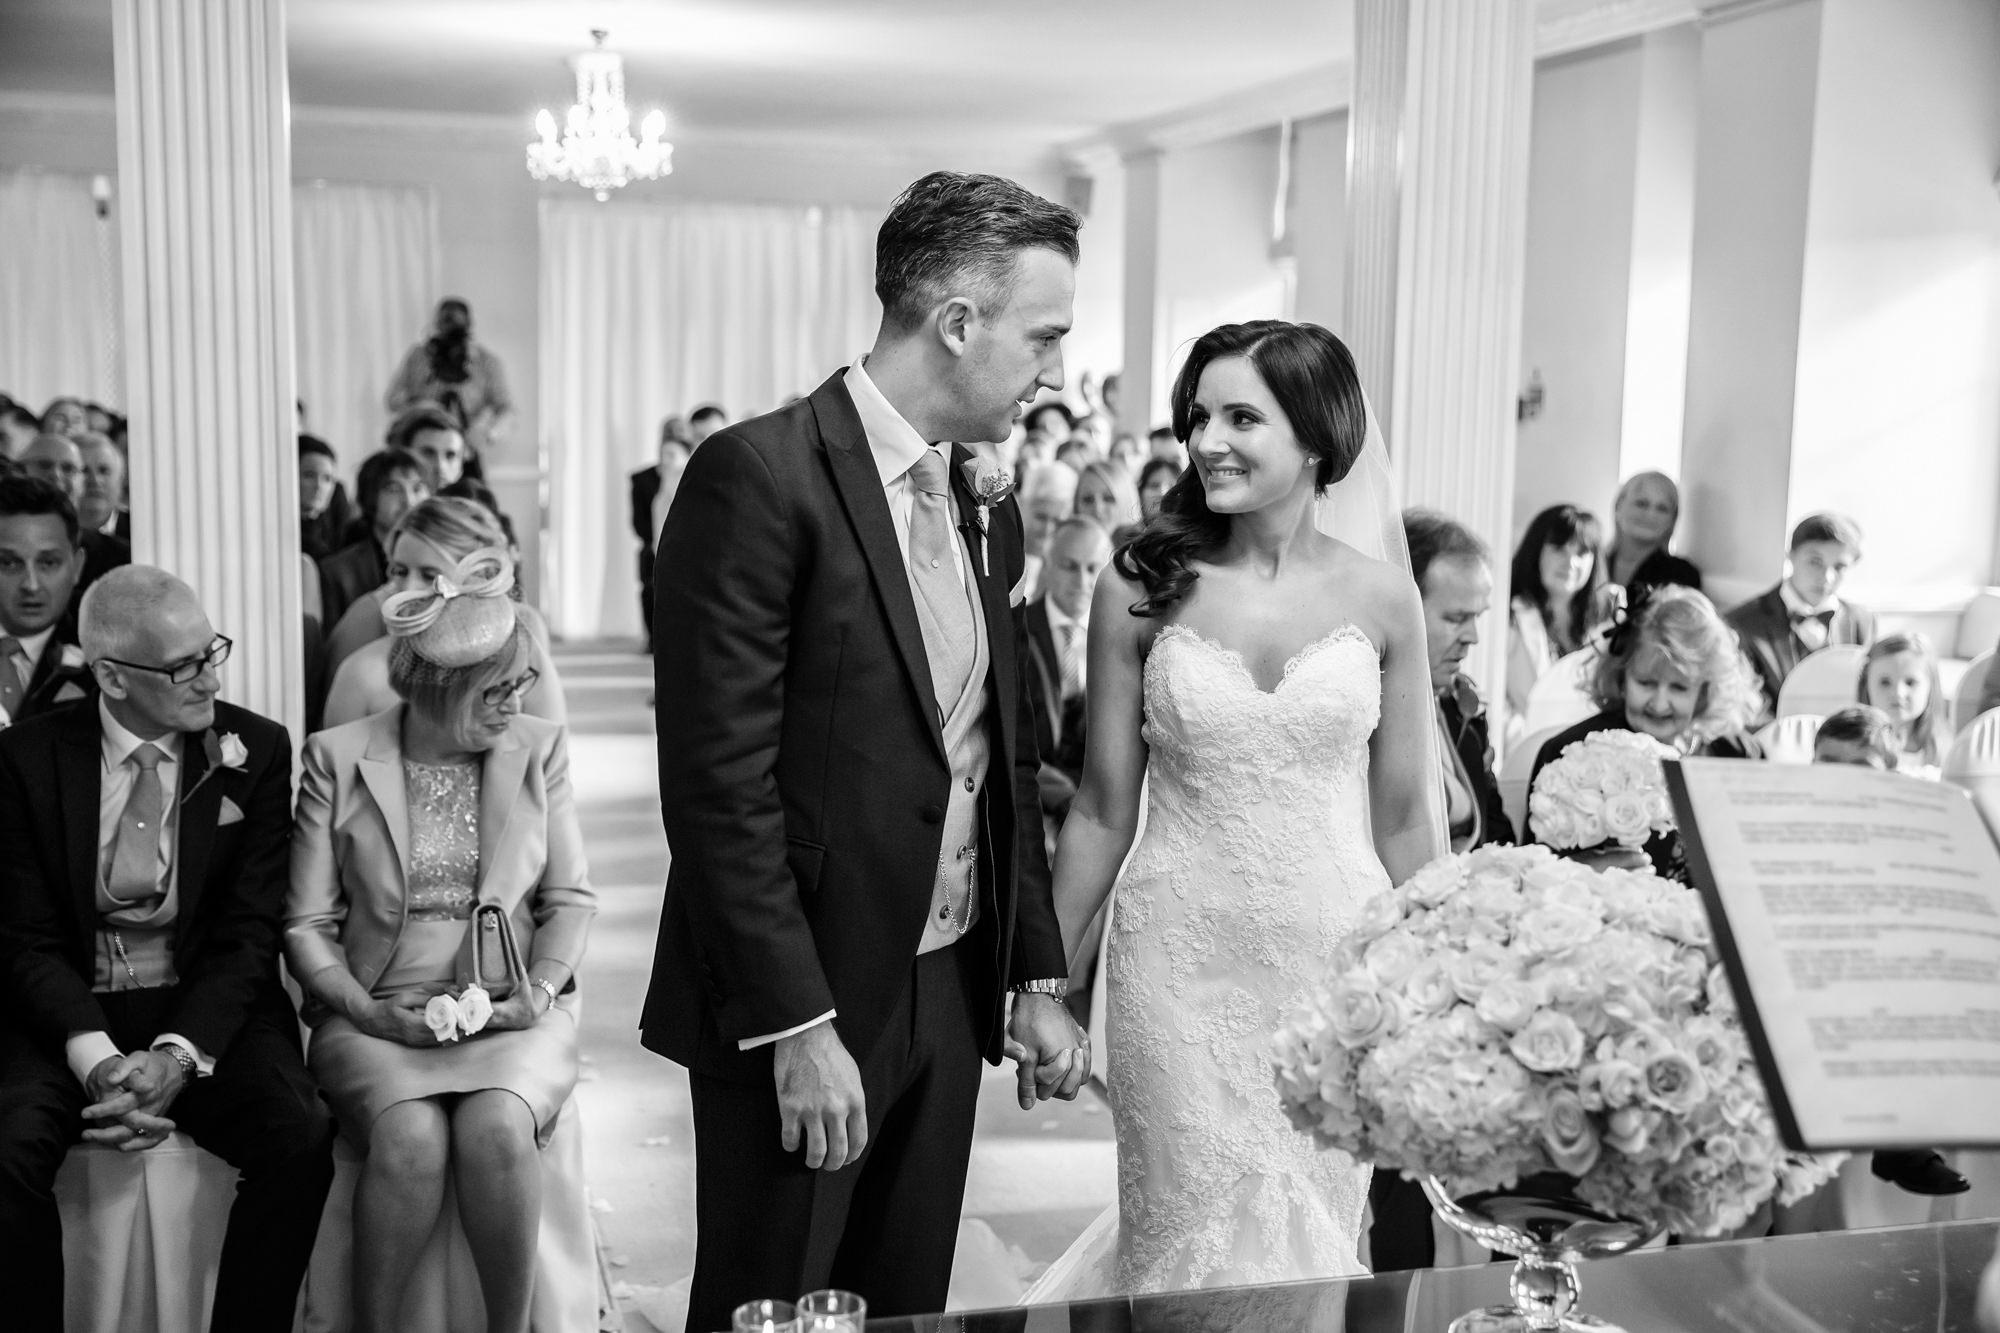 Parklands Quendon Hall Wedding ceremony